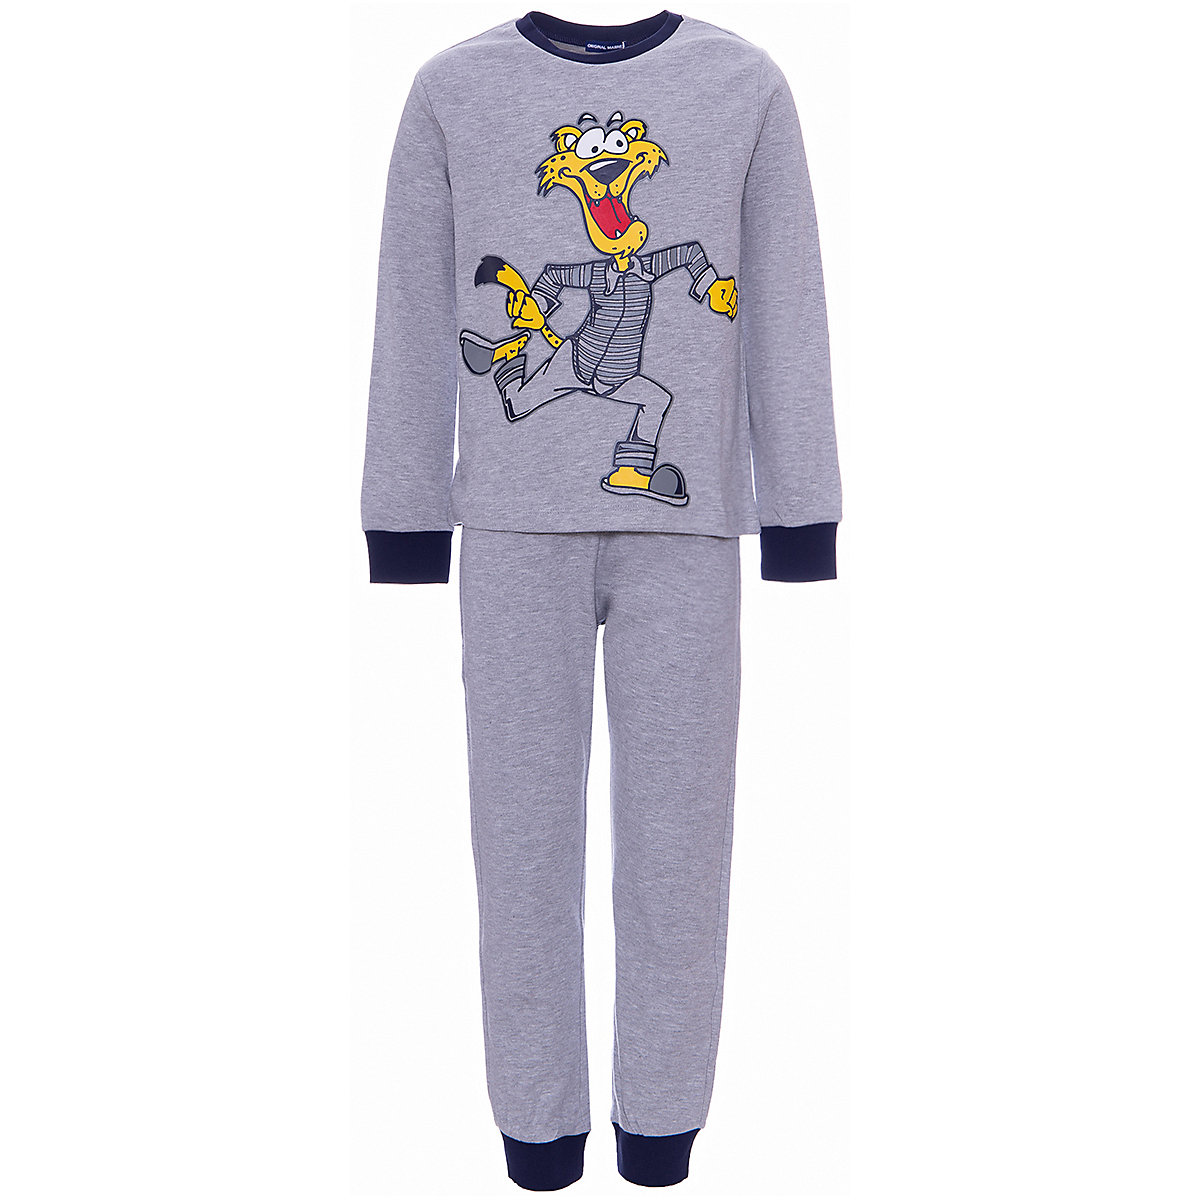 ORIGINAL MARINES Sleepwear & Robes 9501035 Cotton Baby Boys clothing pajamas wu nong wudang tai chi clothing robes uniforms surplices men and women hanfu taijiquan clothing coat winter thick robe